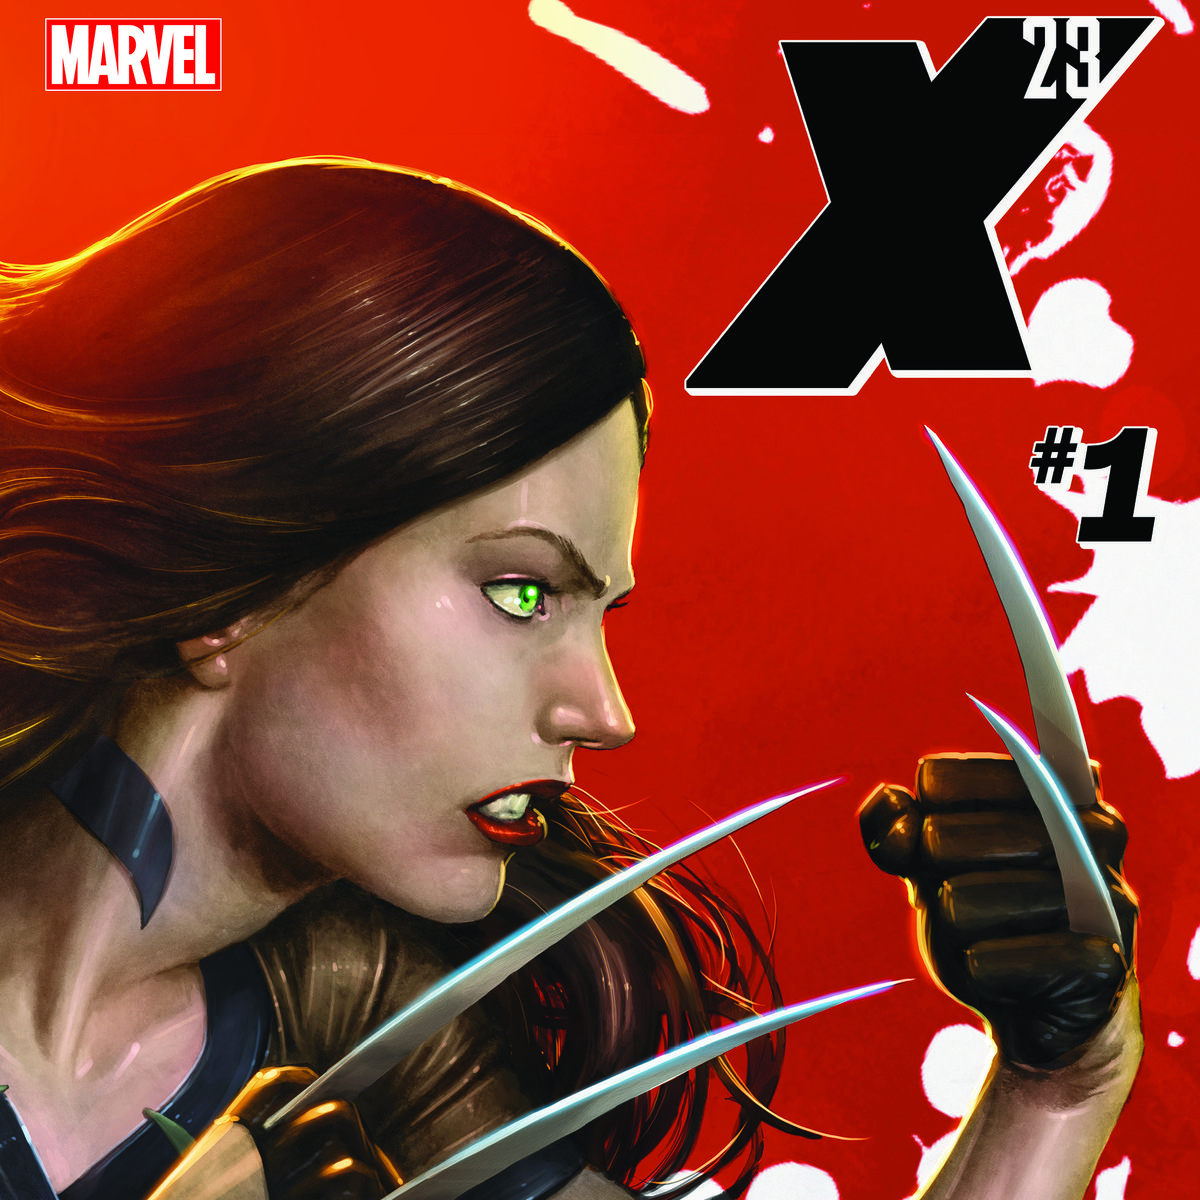 x23 comic